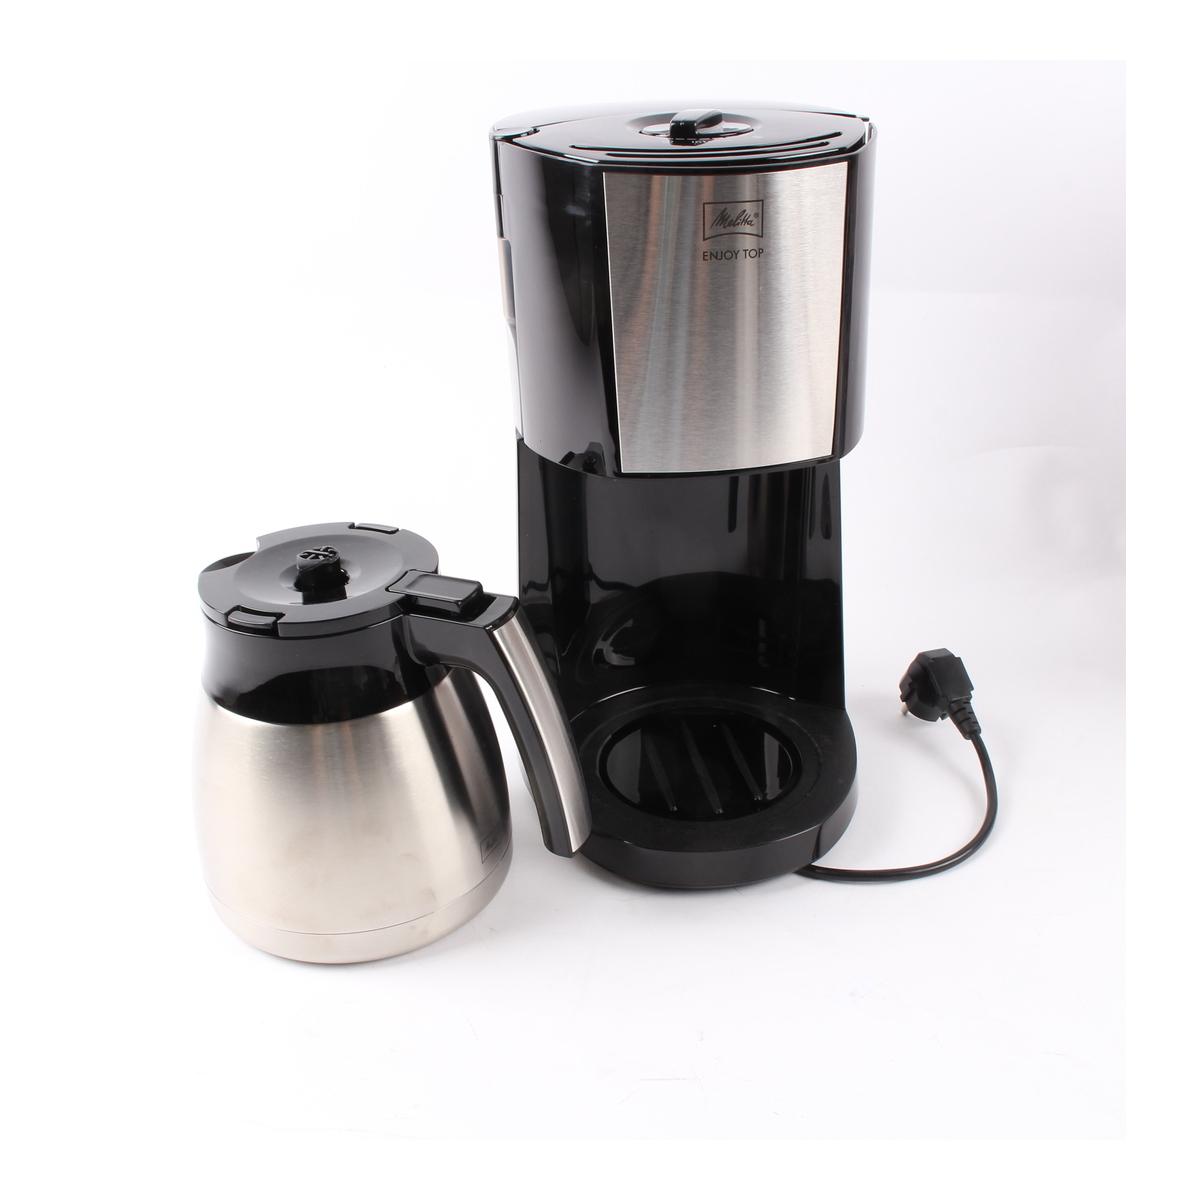 Melitta 1017-08 Enjoy Top Therm Termos Karaflı Filtre Kahve Makinesi